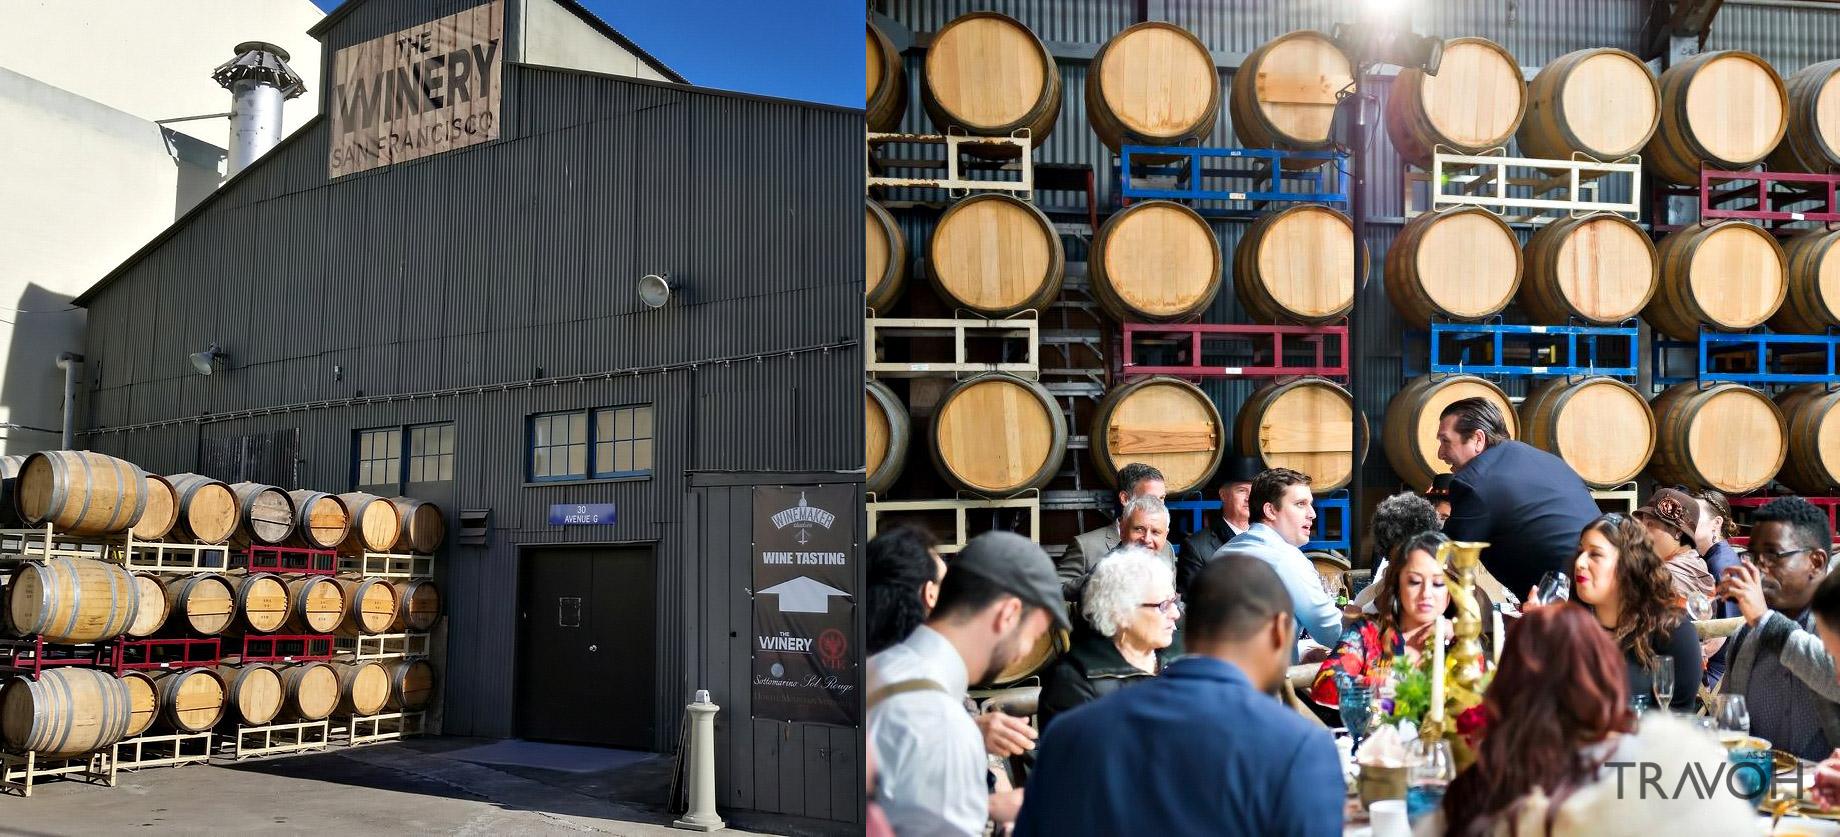 The Winery SF - 30 Avenue G, San Francisco, CA 94130, USA